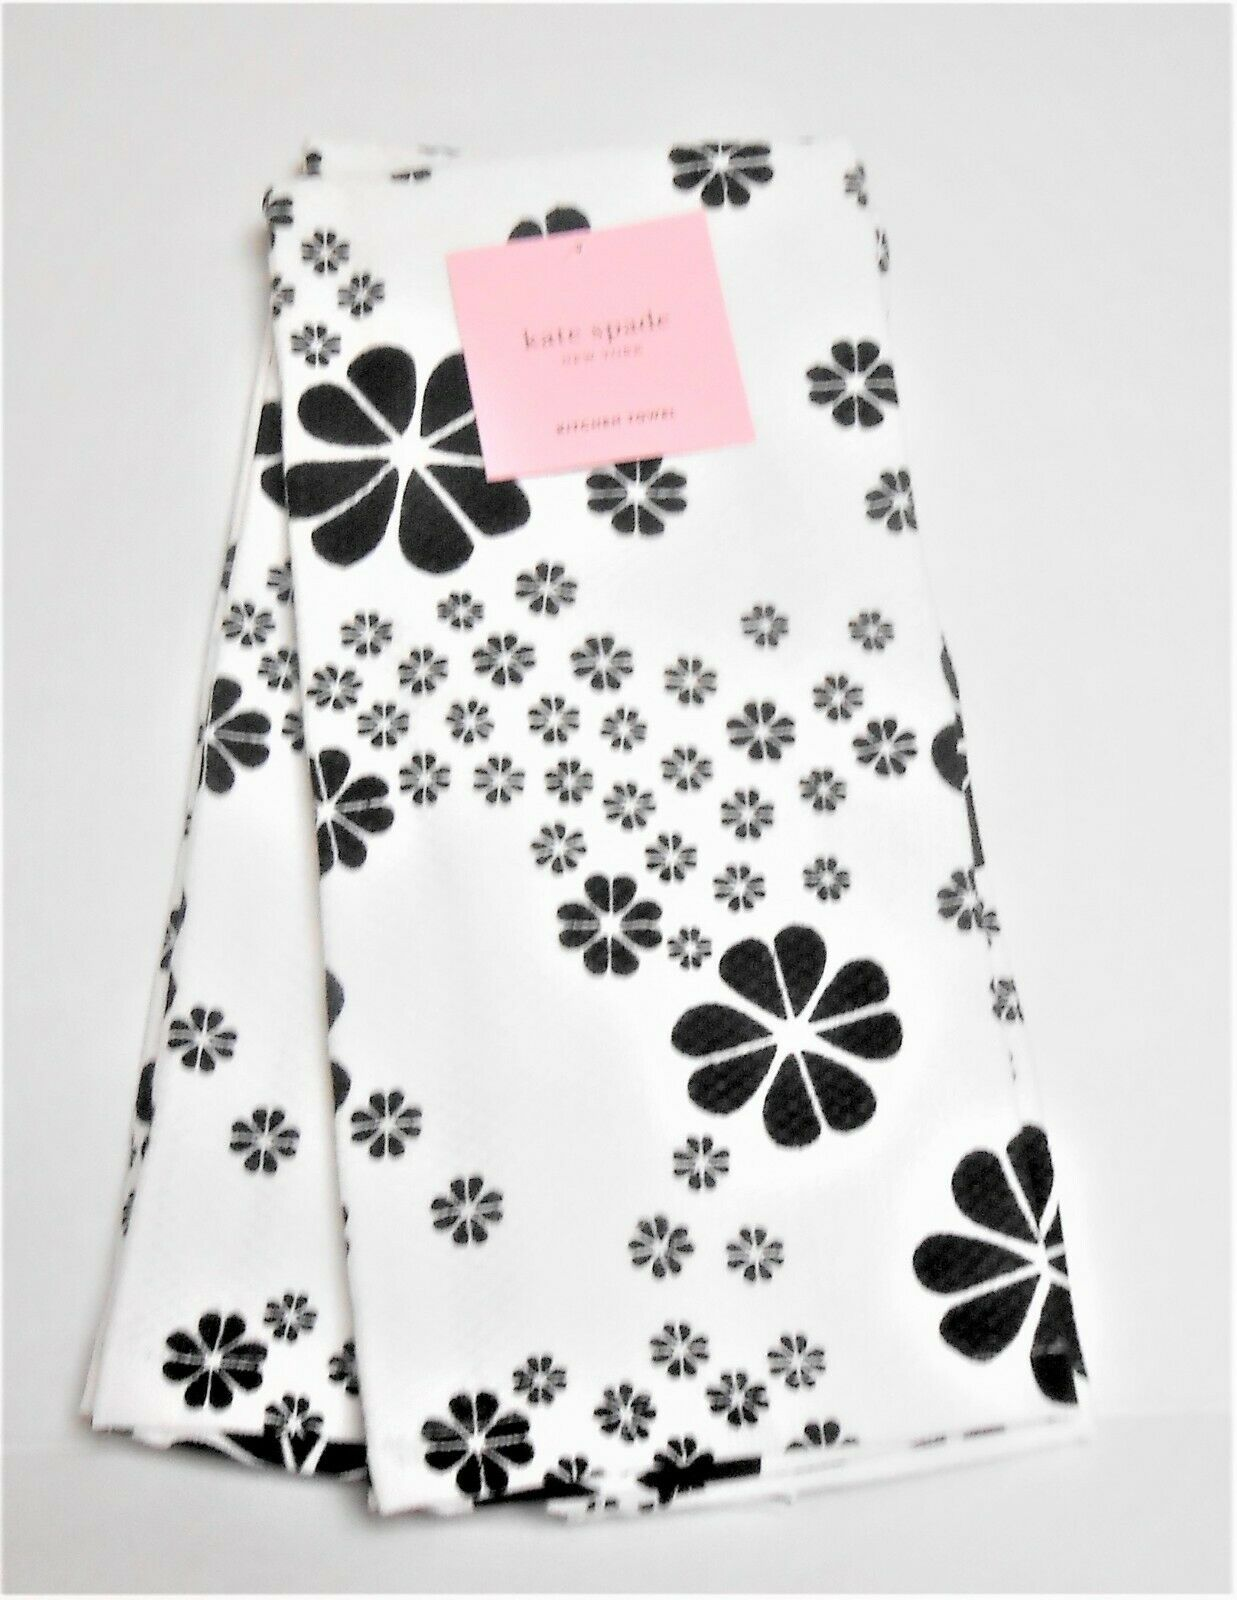 Ritz Royale Collection Solid Kitchen Dish Towel Set Black 2 Piece For Sale Online Ebay